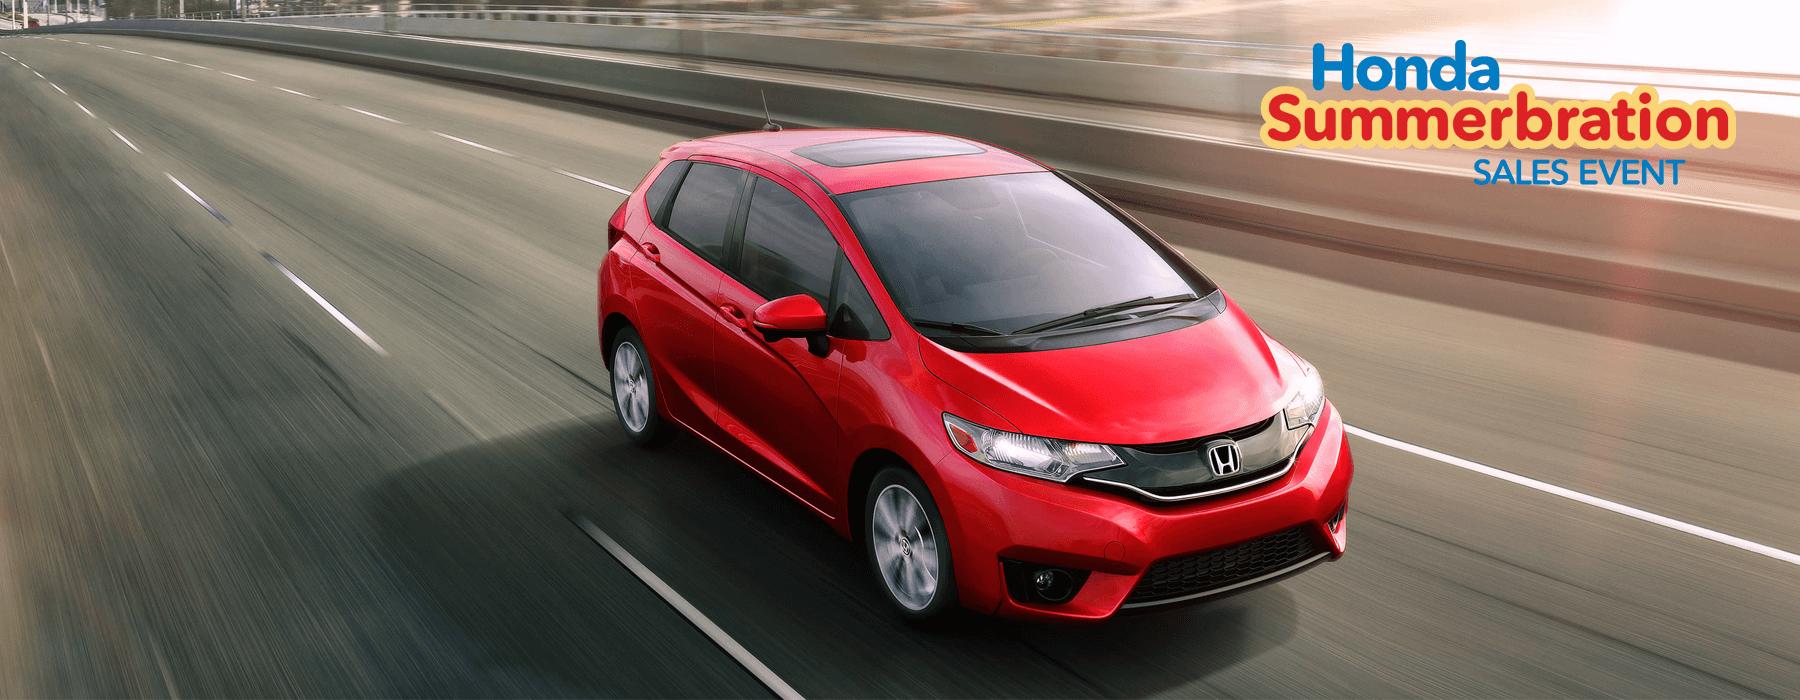 Honda Summerbration Sale 2017 Fit